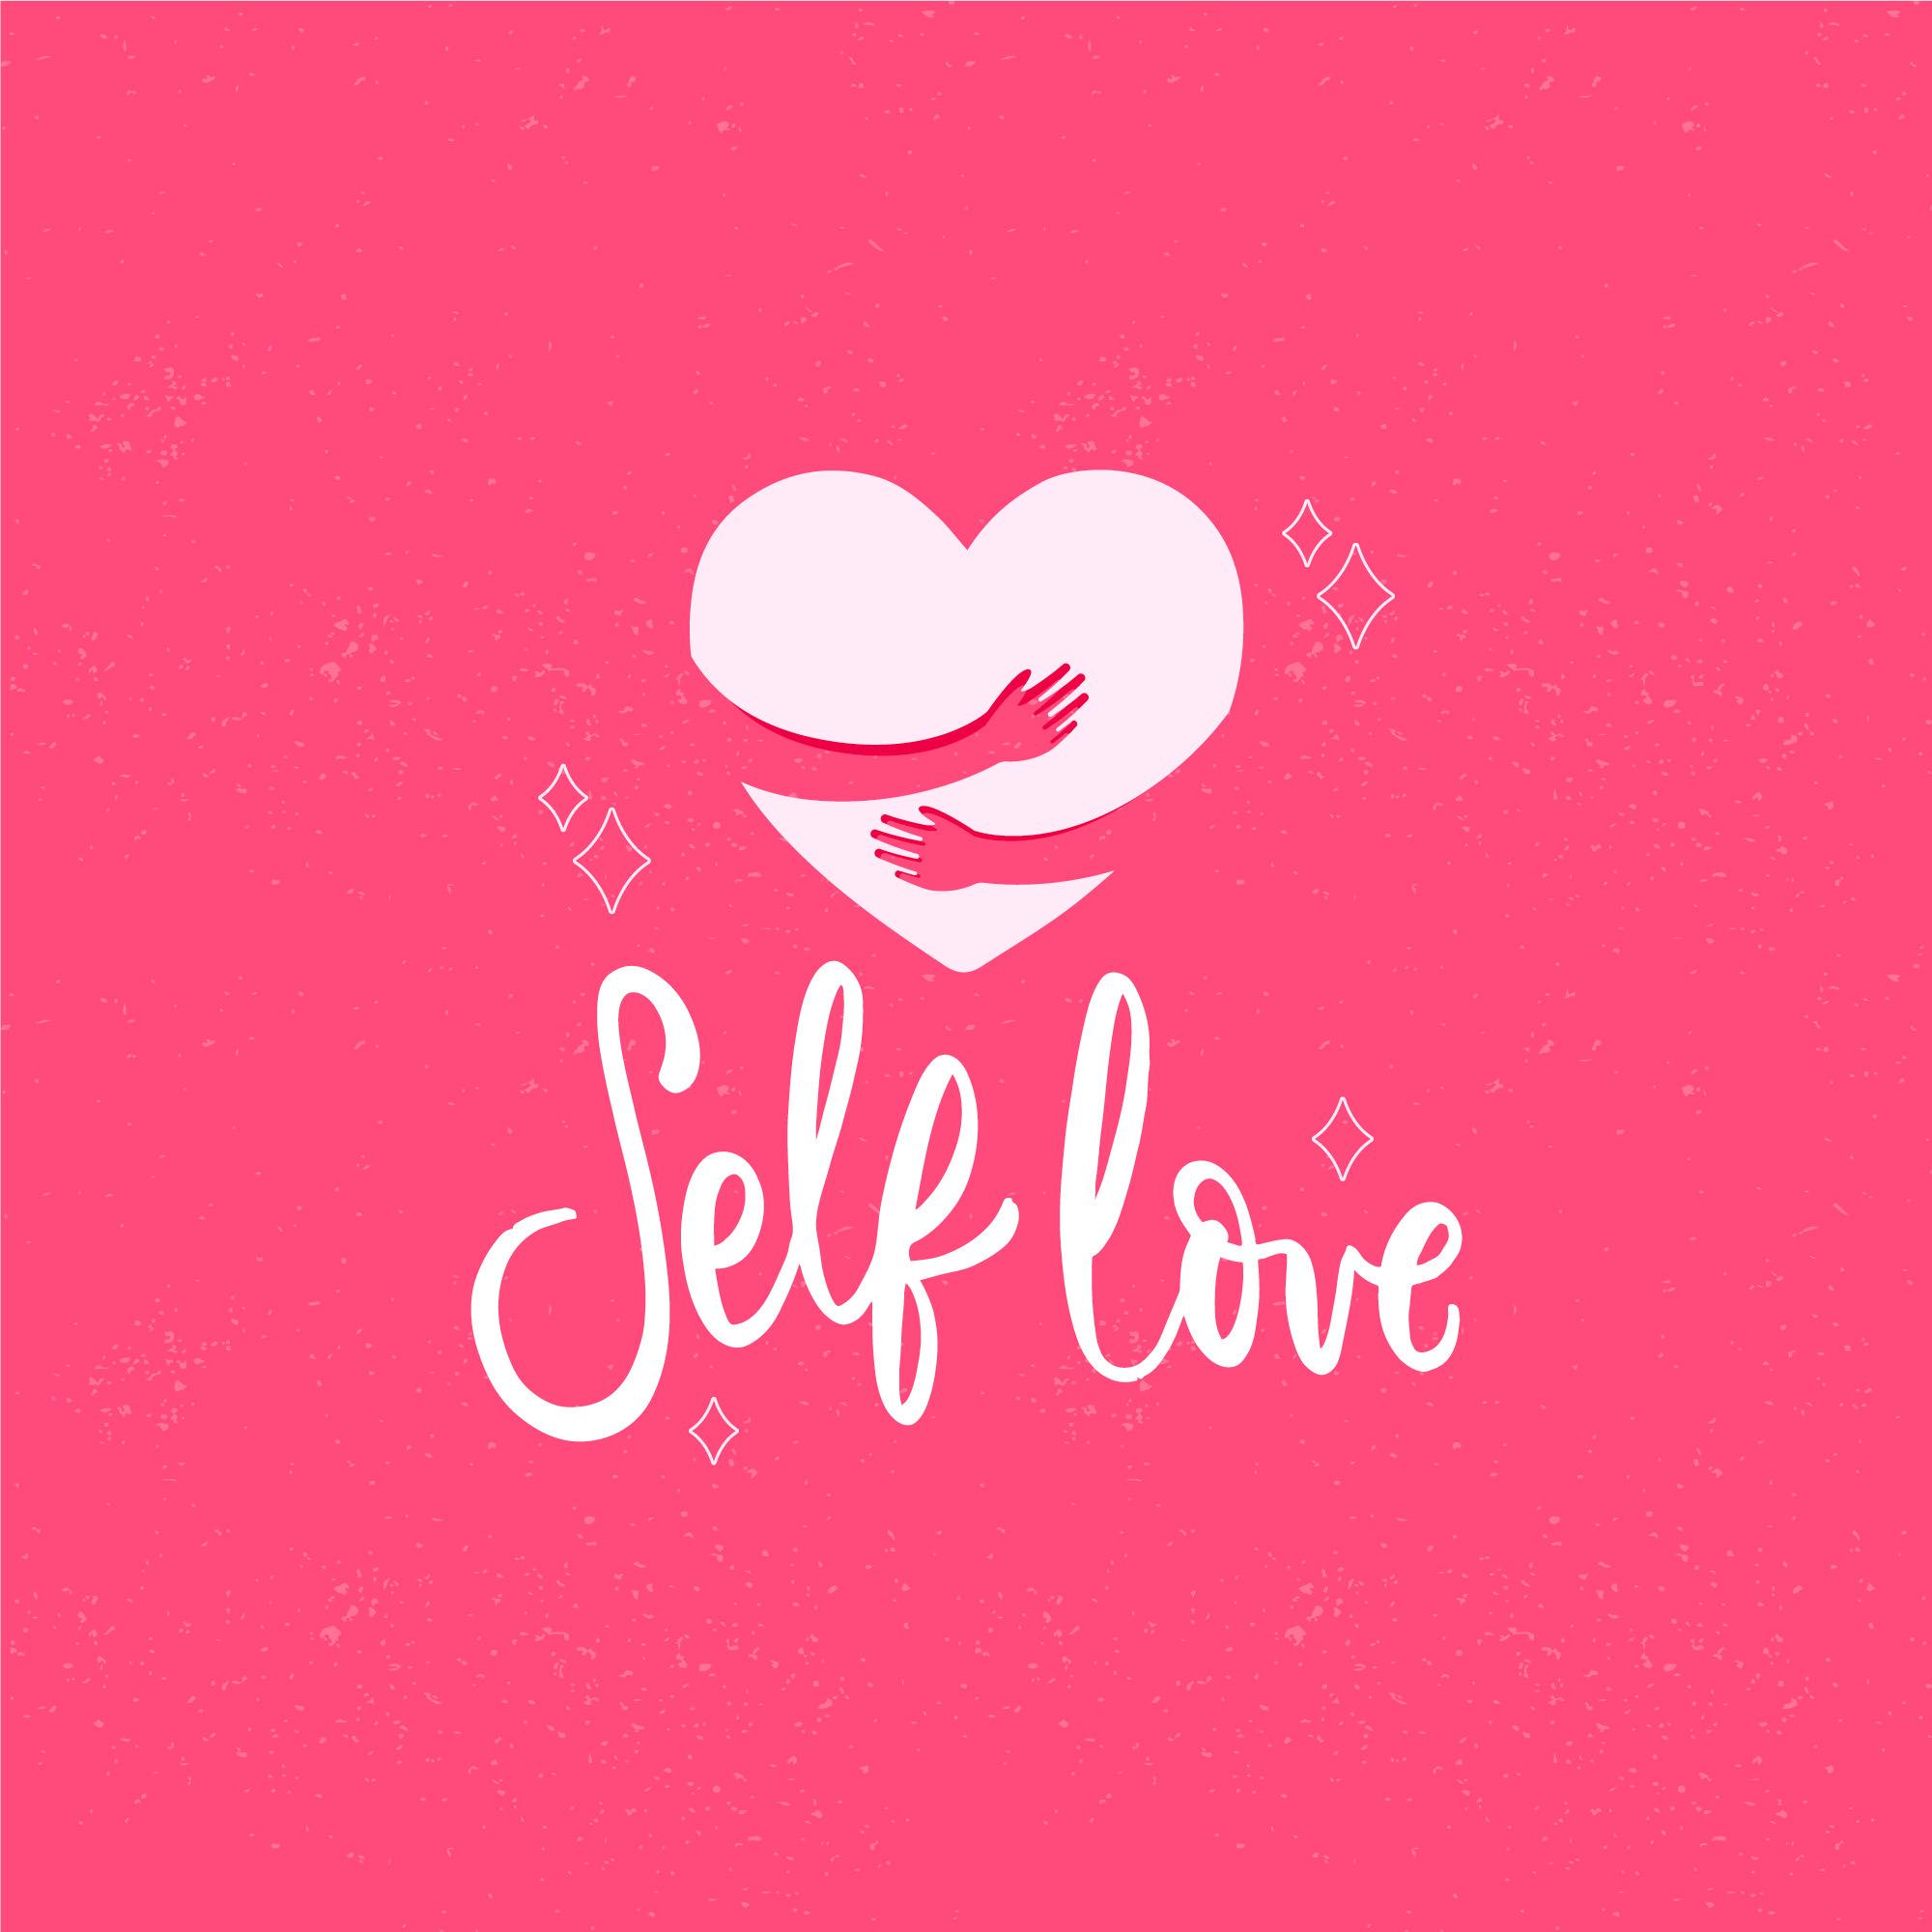 Laura Cherfi - Self-Love